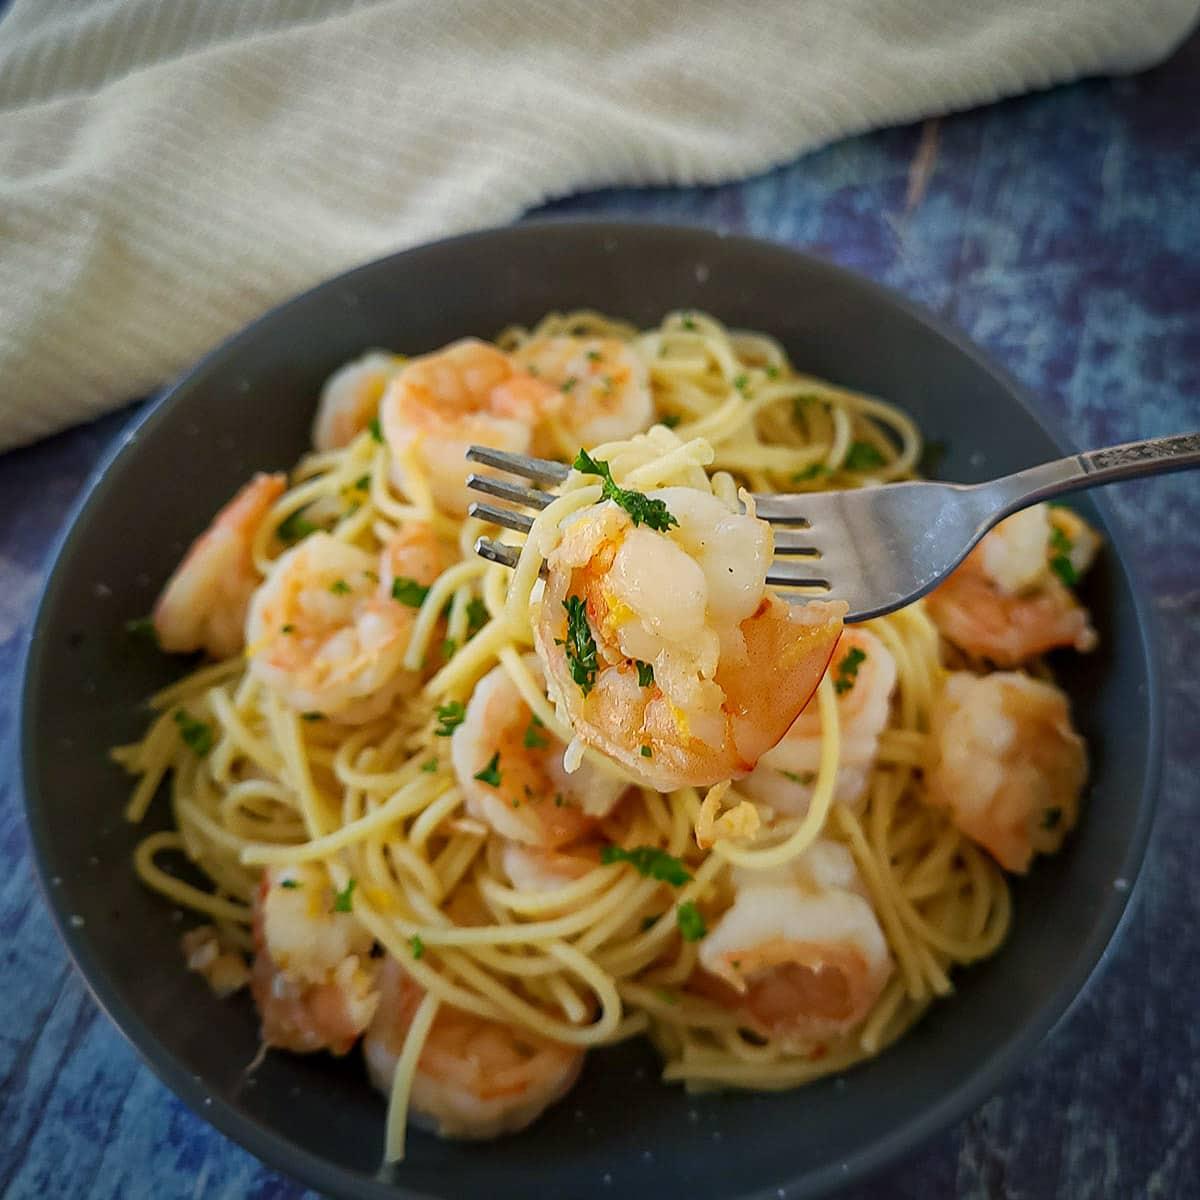 spaghetti with lemon shrimp in a gray bowl